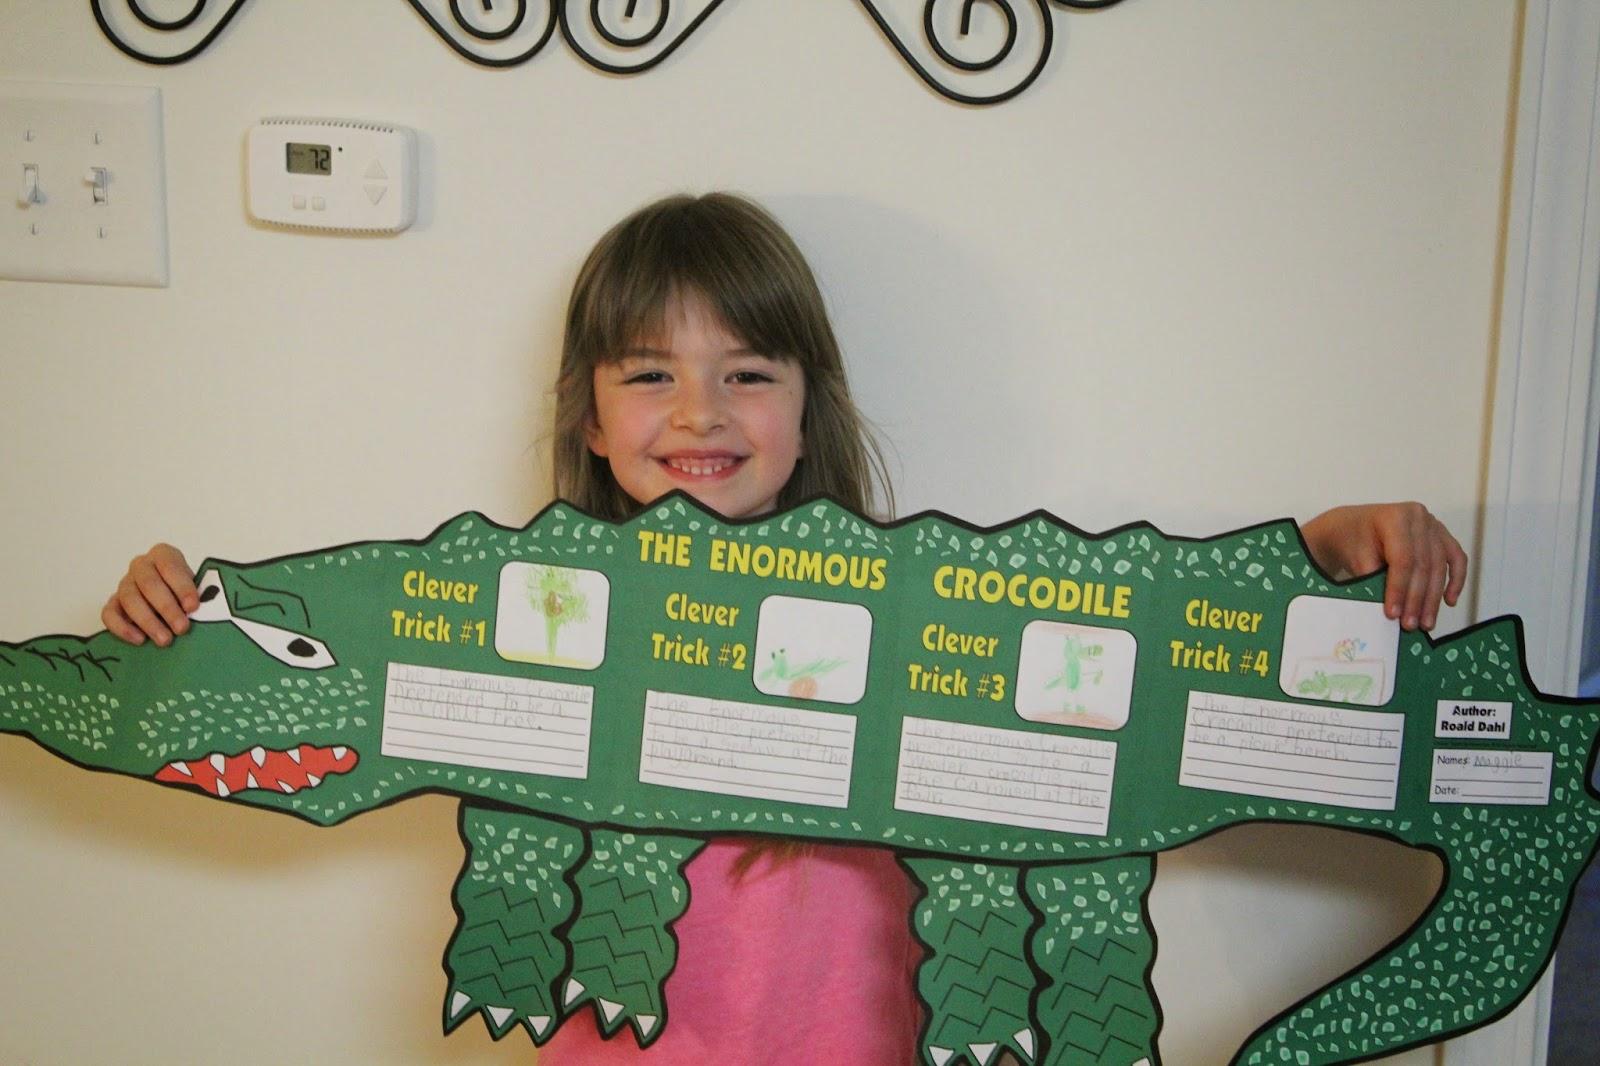 Spark And All The Enormous Crocodile